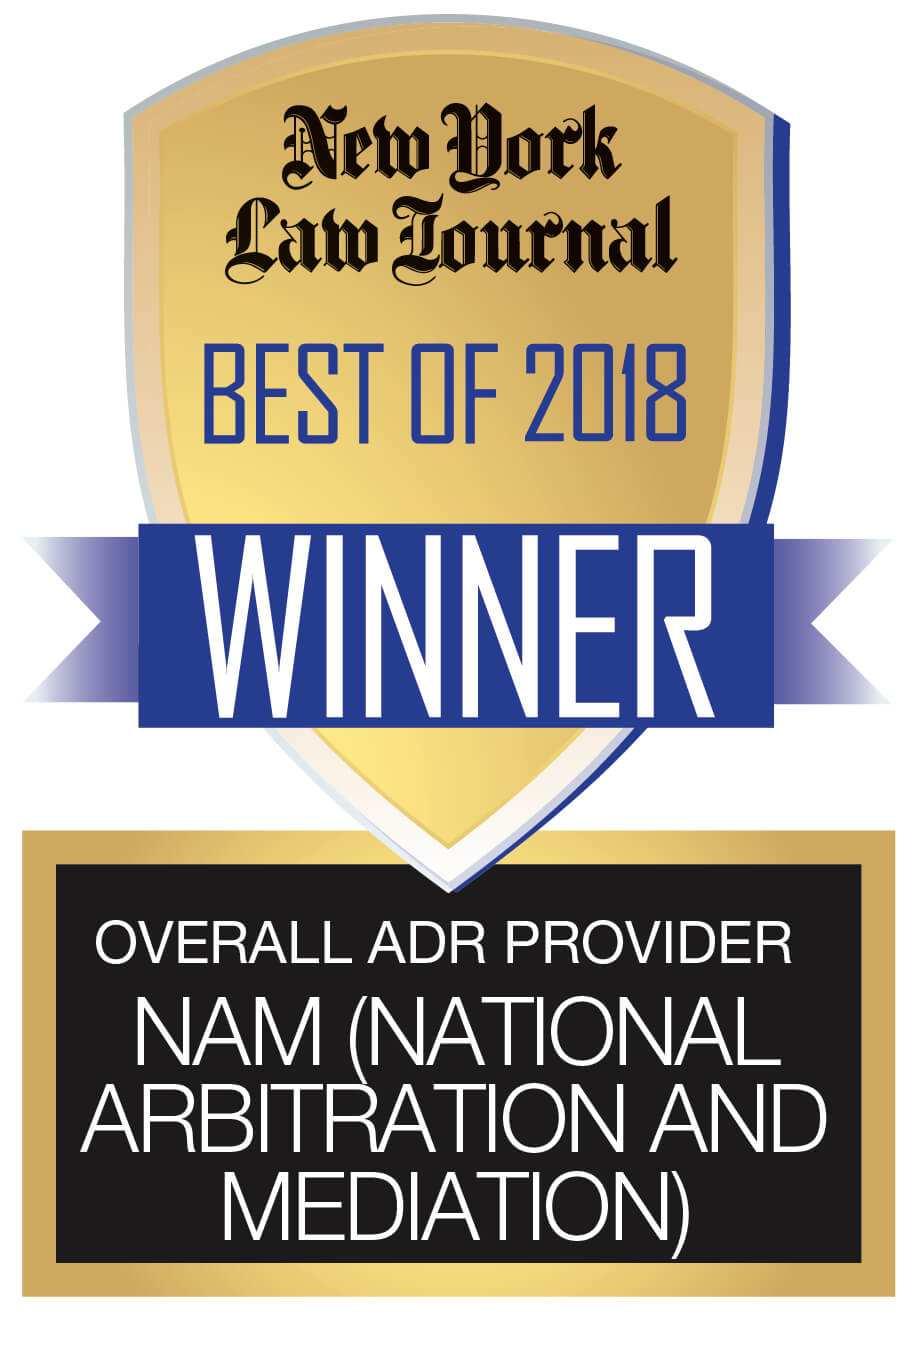 NAM (National Arbitration and Mediation) Badge Best of 2018 Winner Overall ADR Provider New York Law Journal